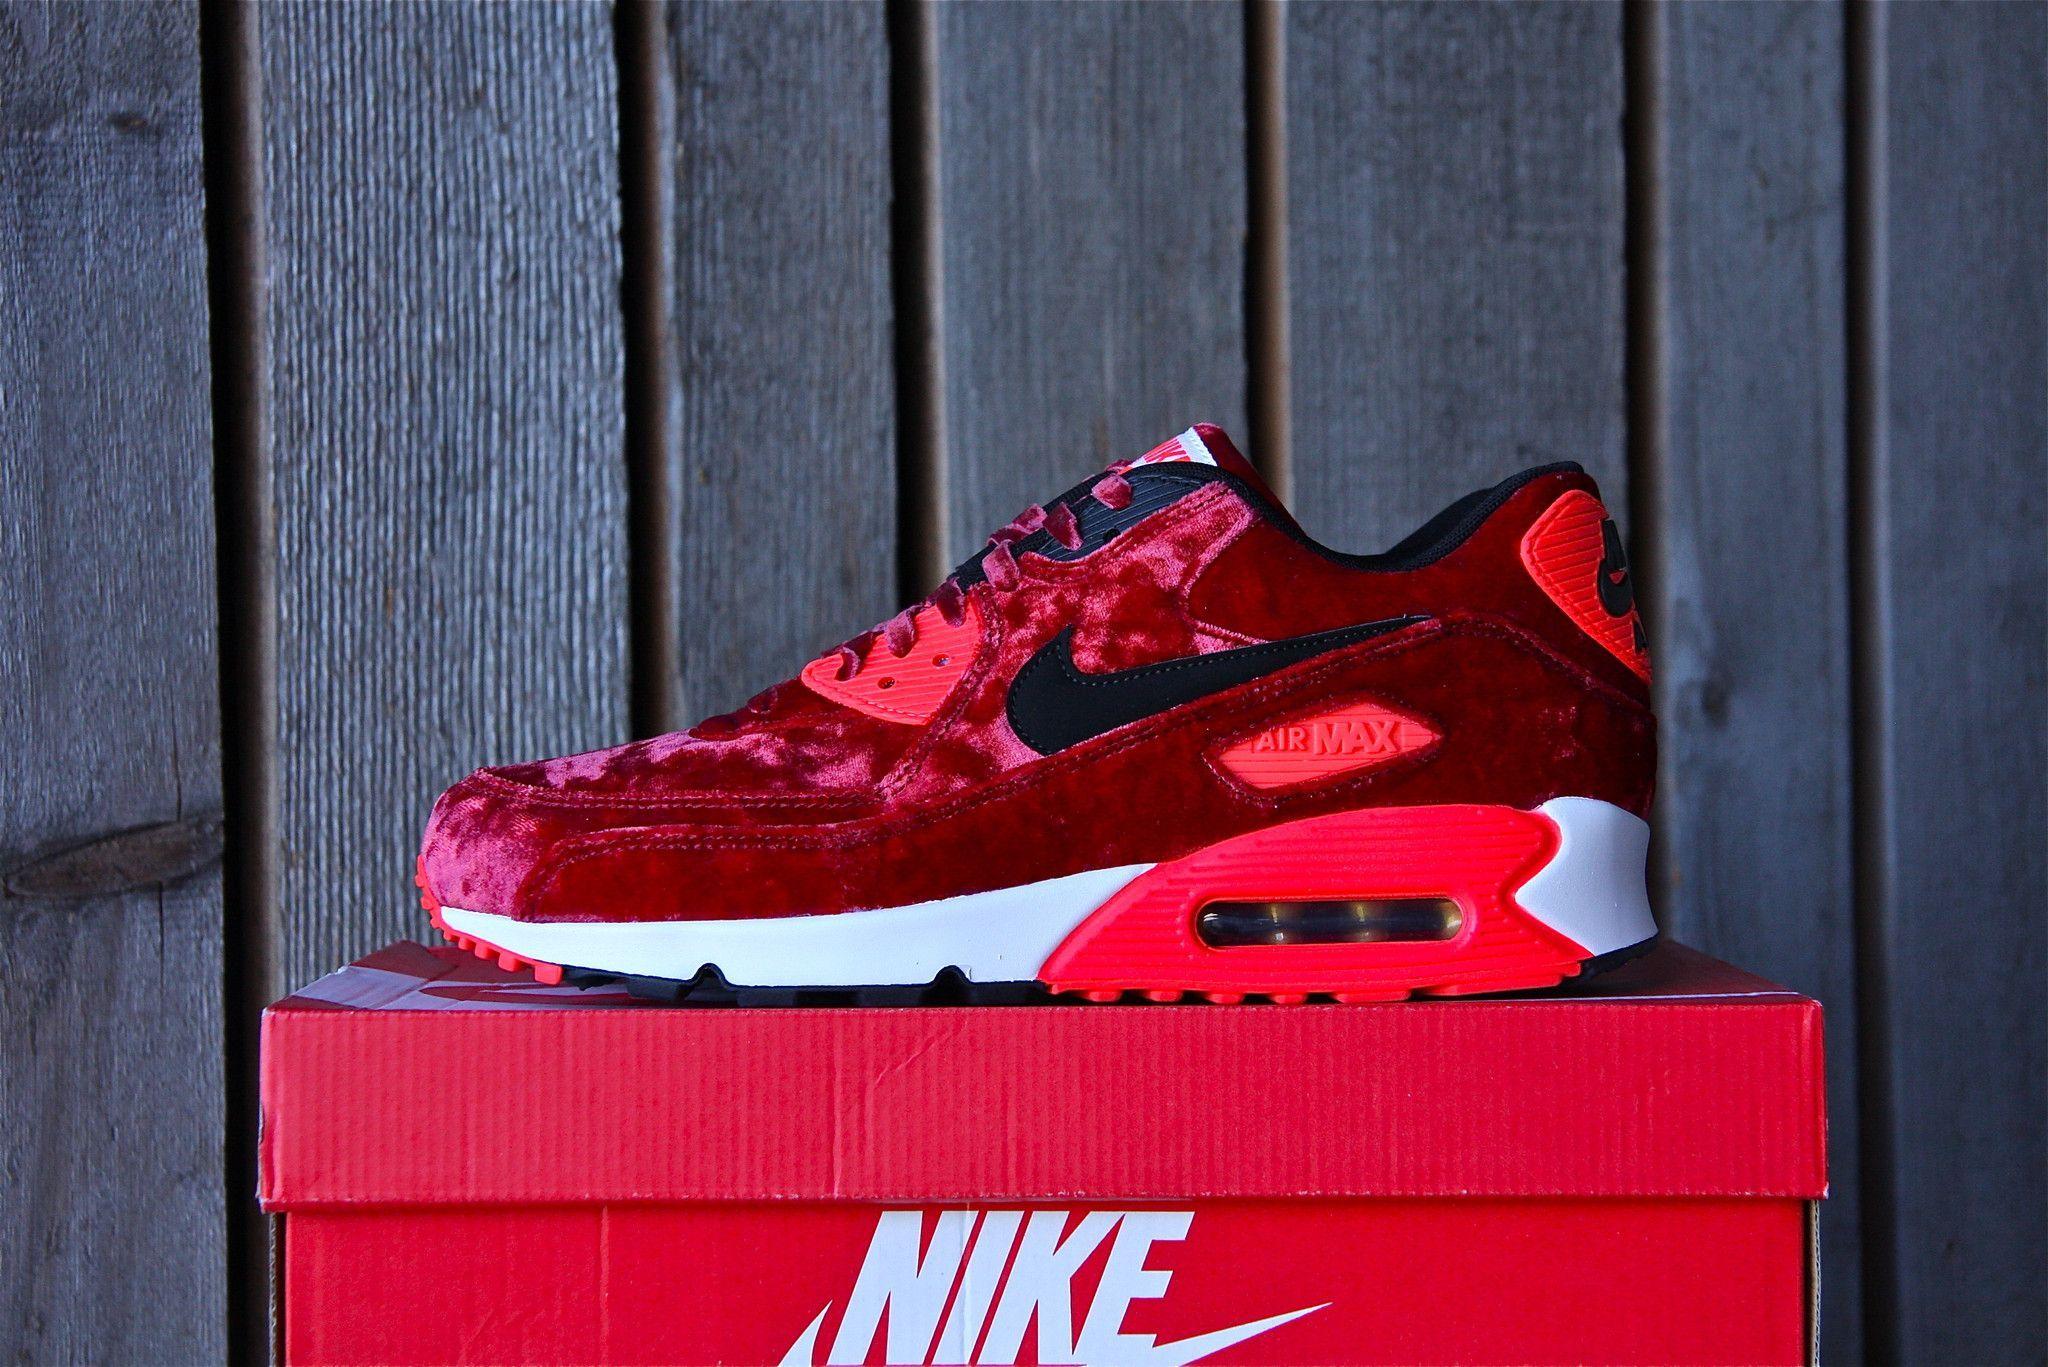 Nike Air Max 90 Red Velvet 25th Anniversary Infrared 725235